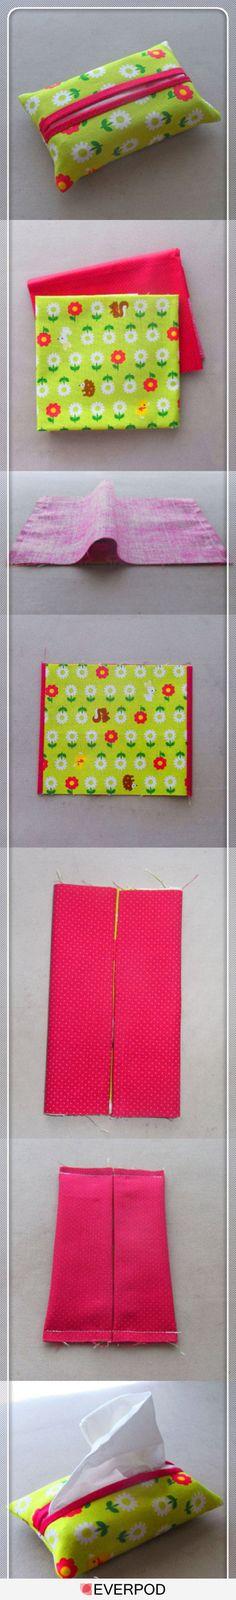 idea, gift, craft, bag, tutorial, tissue boxes, beginner sewing projects, tissu holder, diy